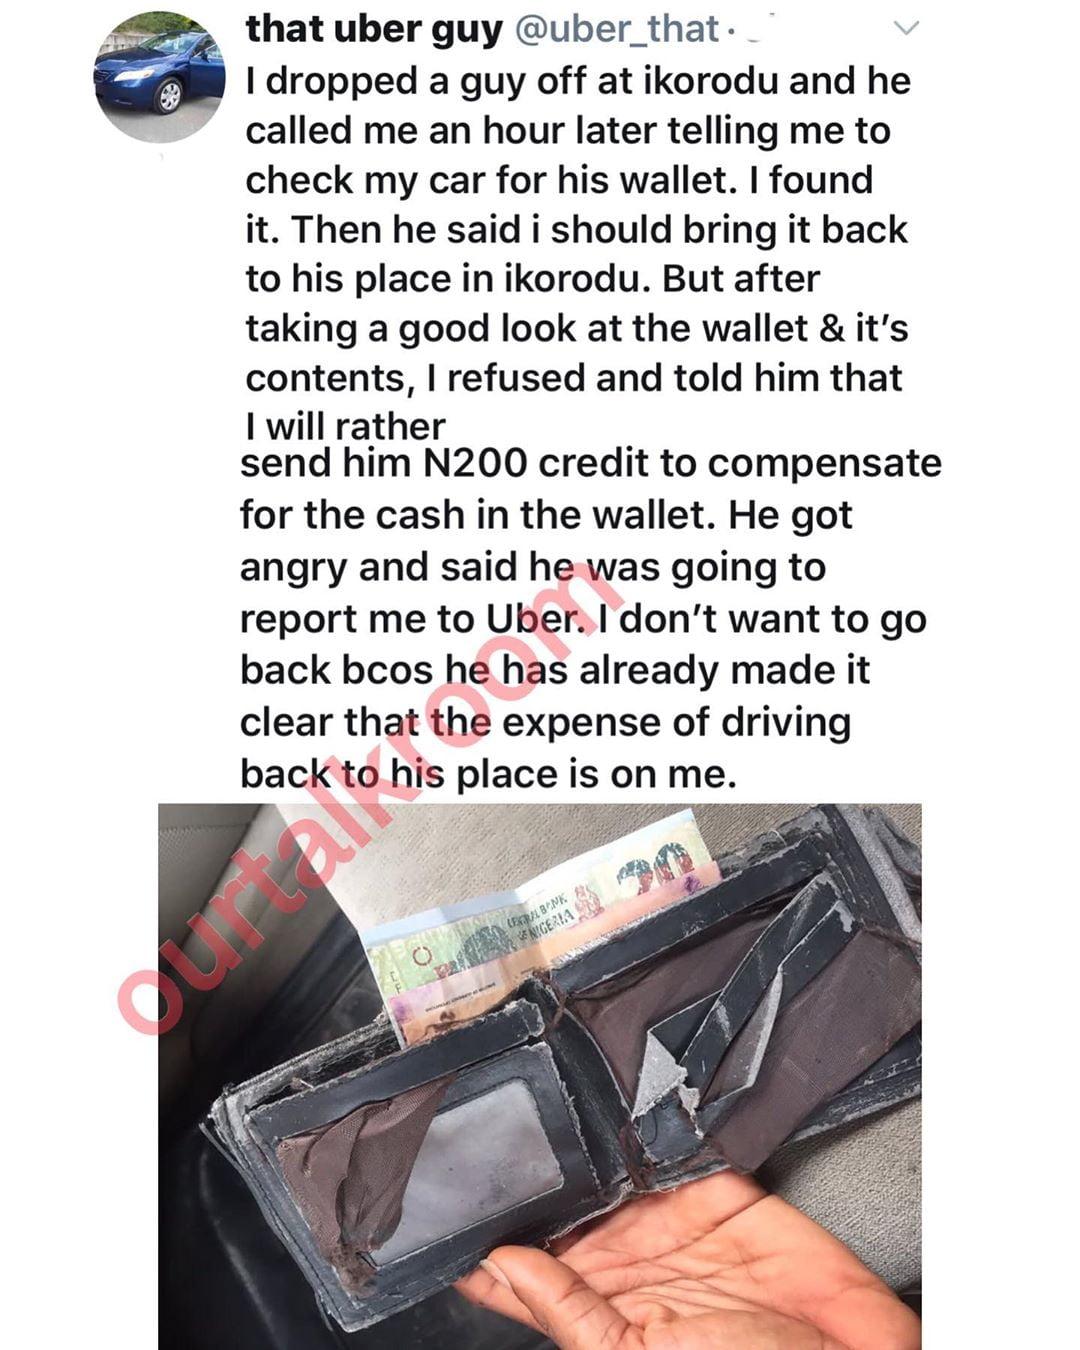 75208774 166500734546051 7787343940049146568 n - Uber Driver Narrates Shocking Reason He Has Refused To Return Passenger's Forgotten Wallet